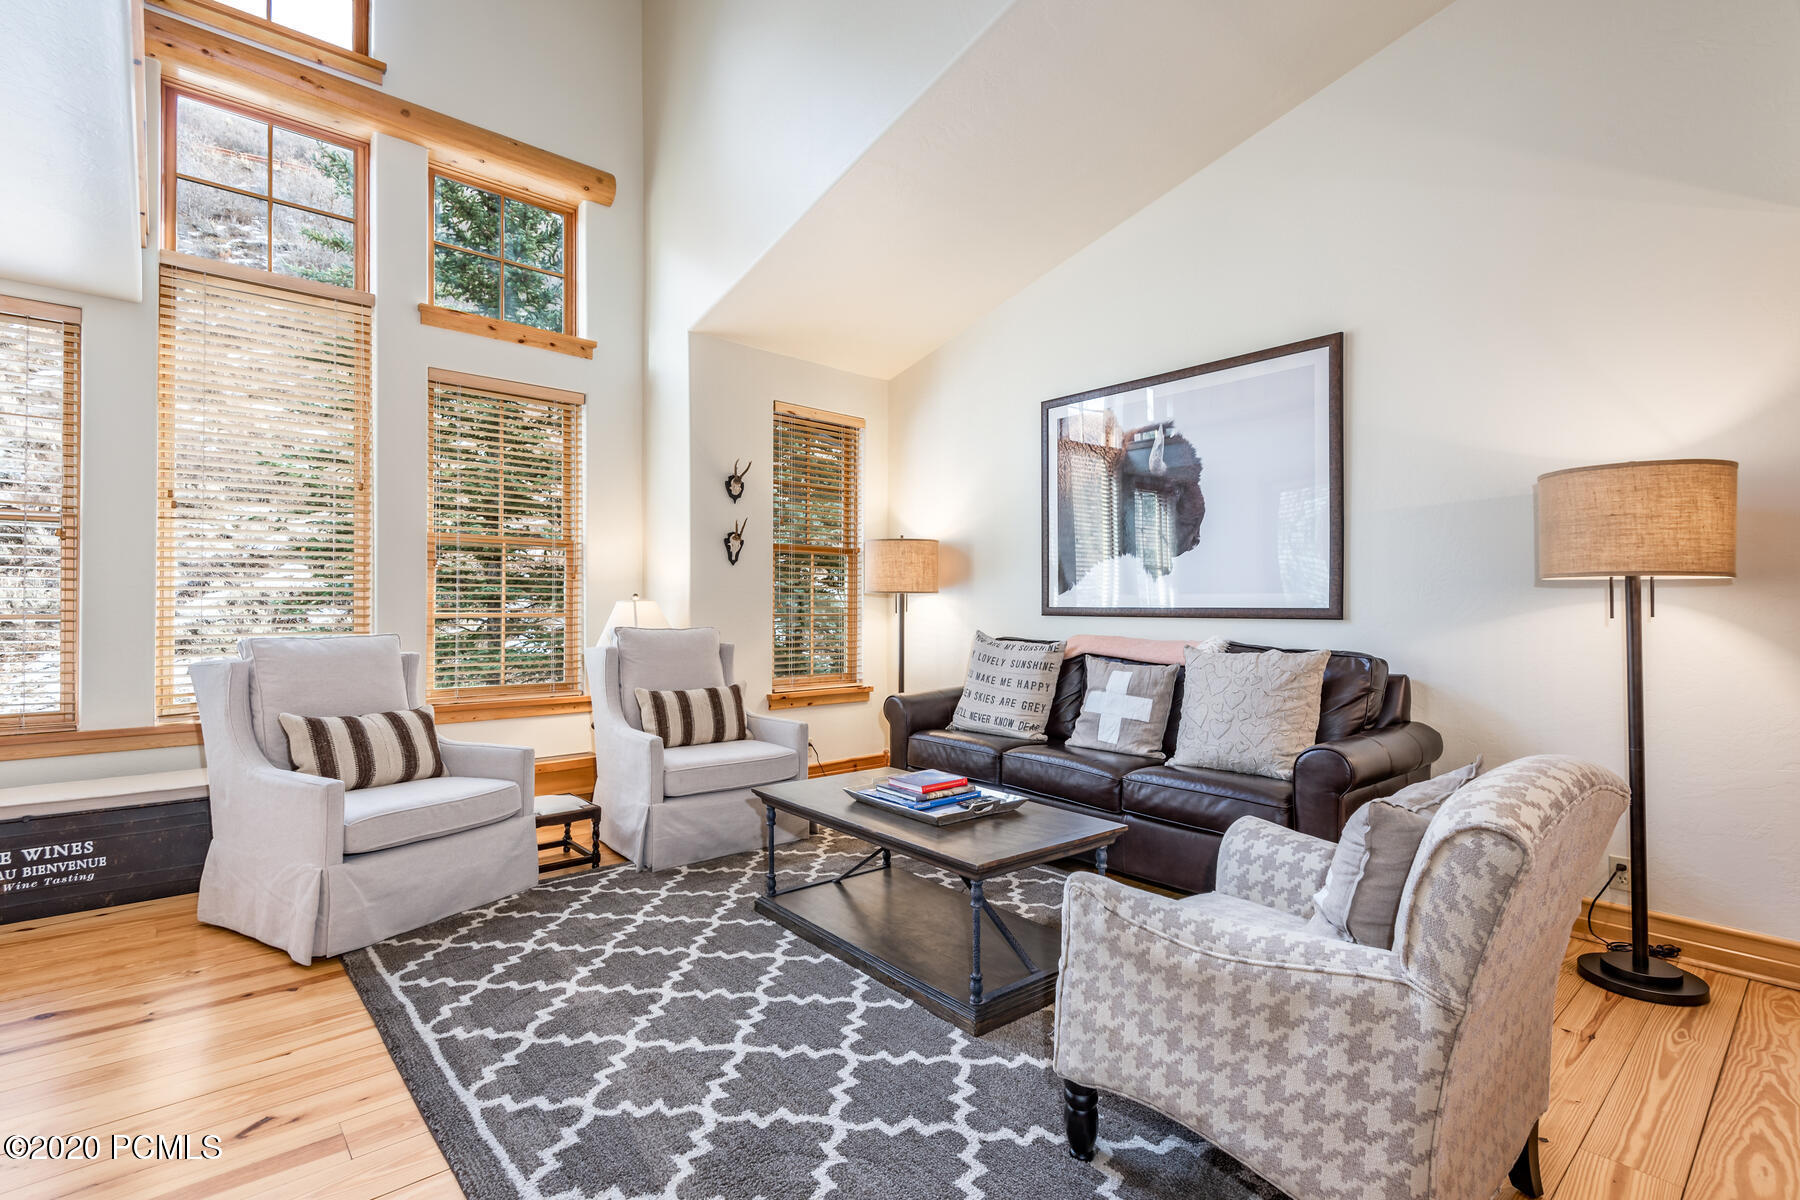 2900 Deer Valley Dr, Park City, Utah 84060, 3 Bedrooms Bedrooms, ,4 BathroomsBathrooms,Condominium,For Sale,Deer Valley Dr,12004782